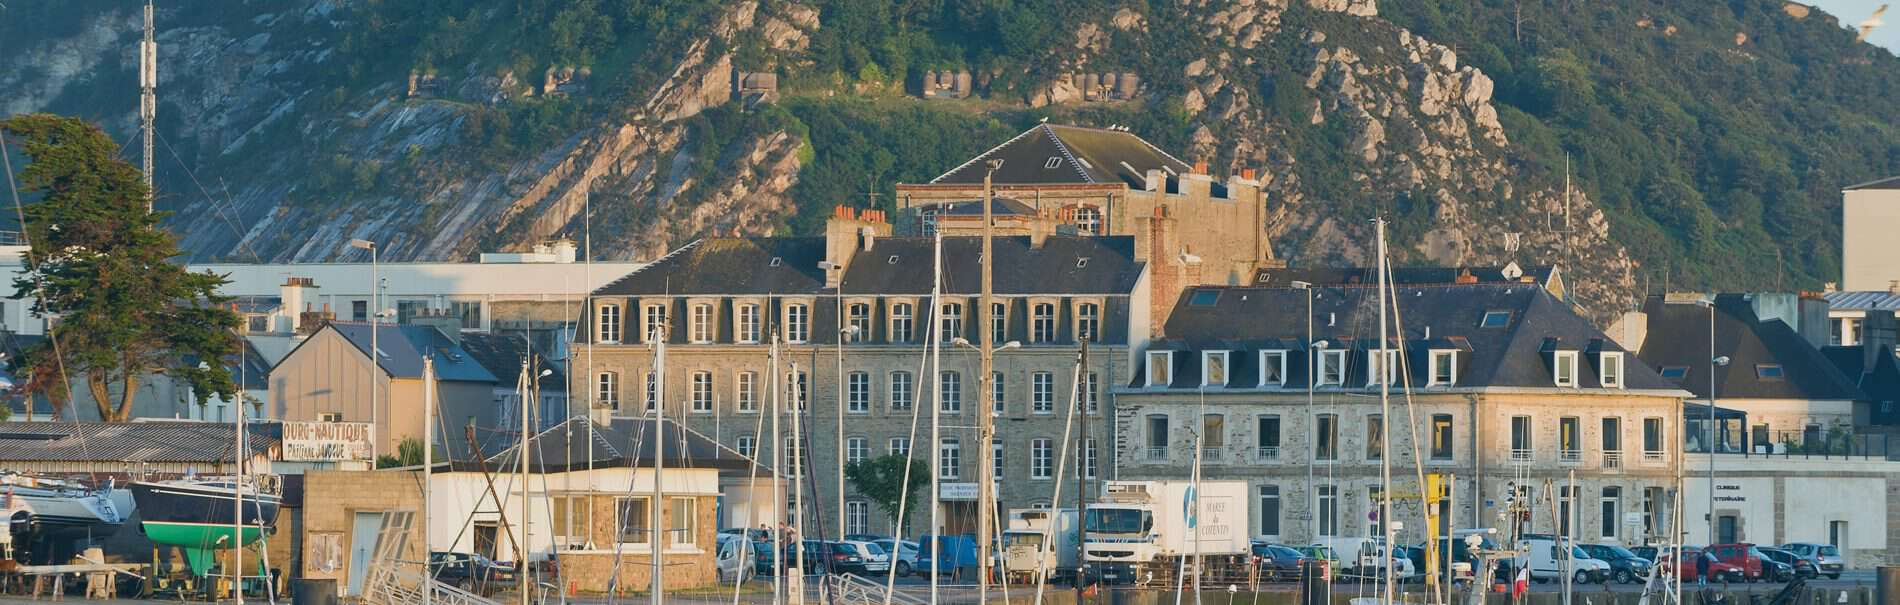 cherbourg-en-cotentin.jpg